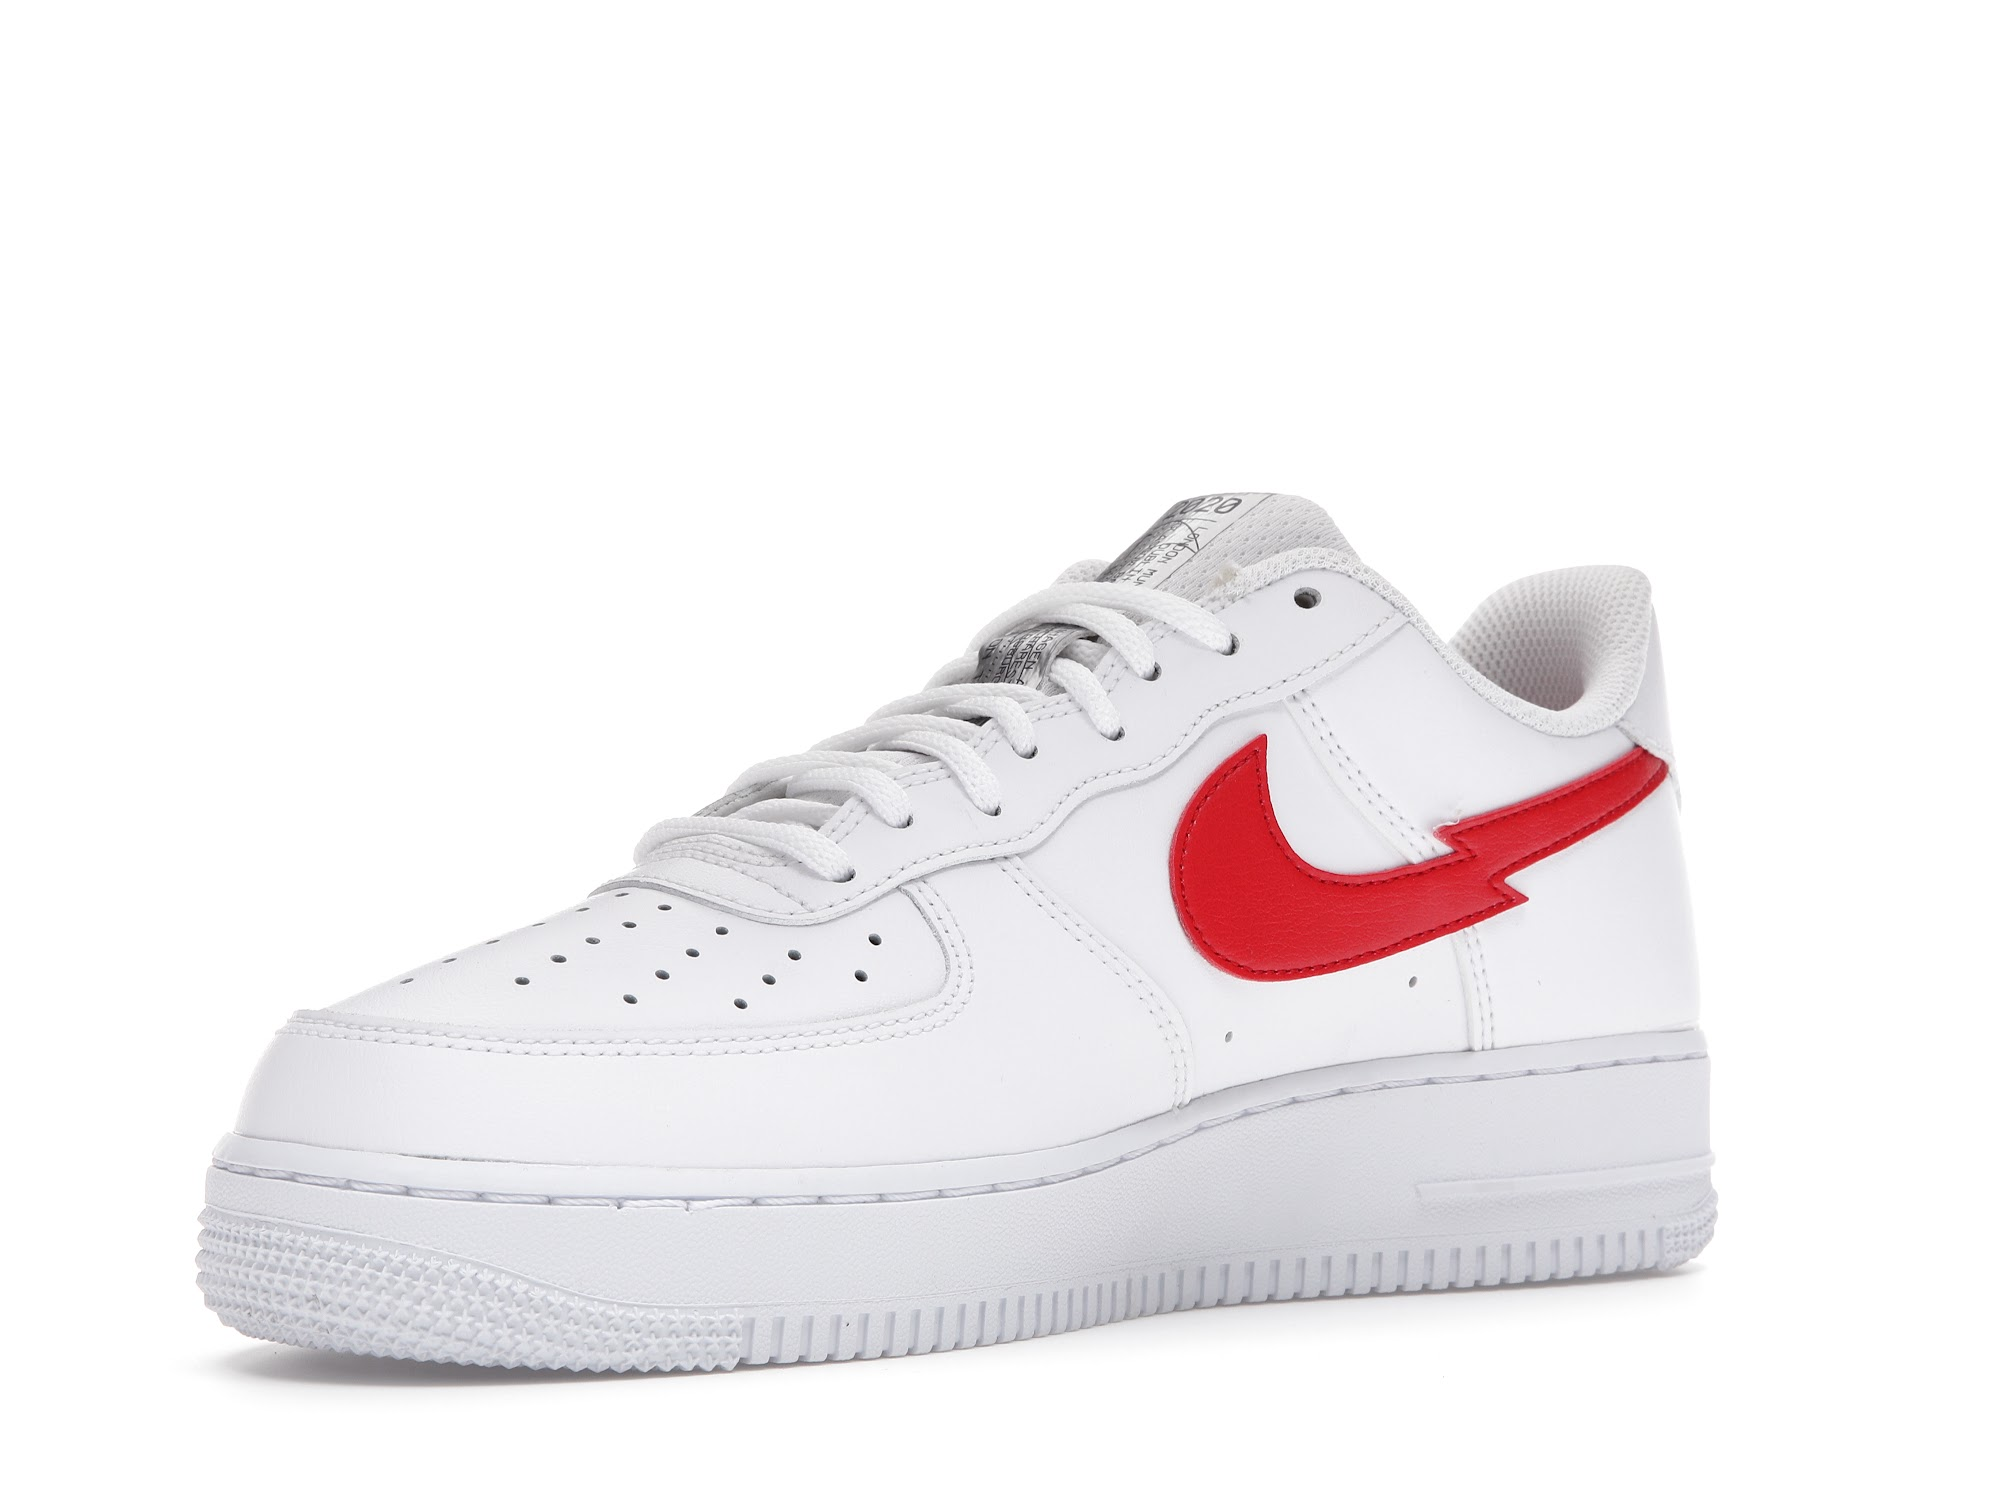 Nike Air Force 1 Low Euro Tour (2020) - CW7577-100